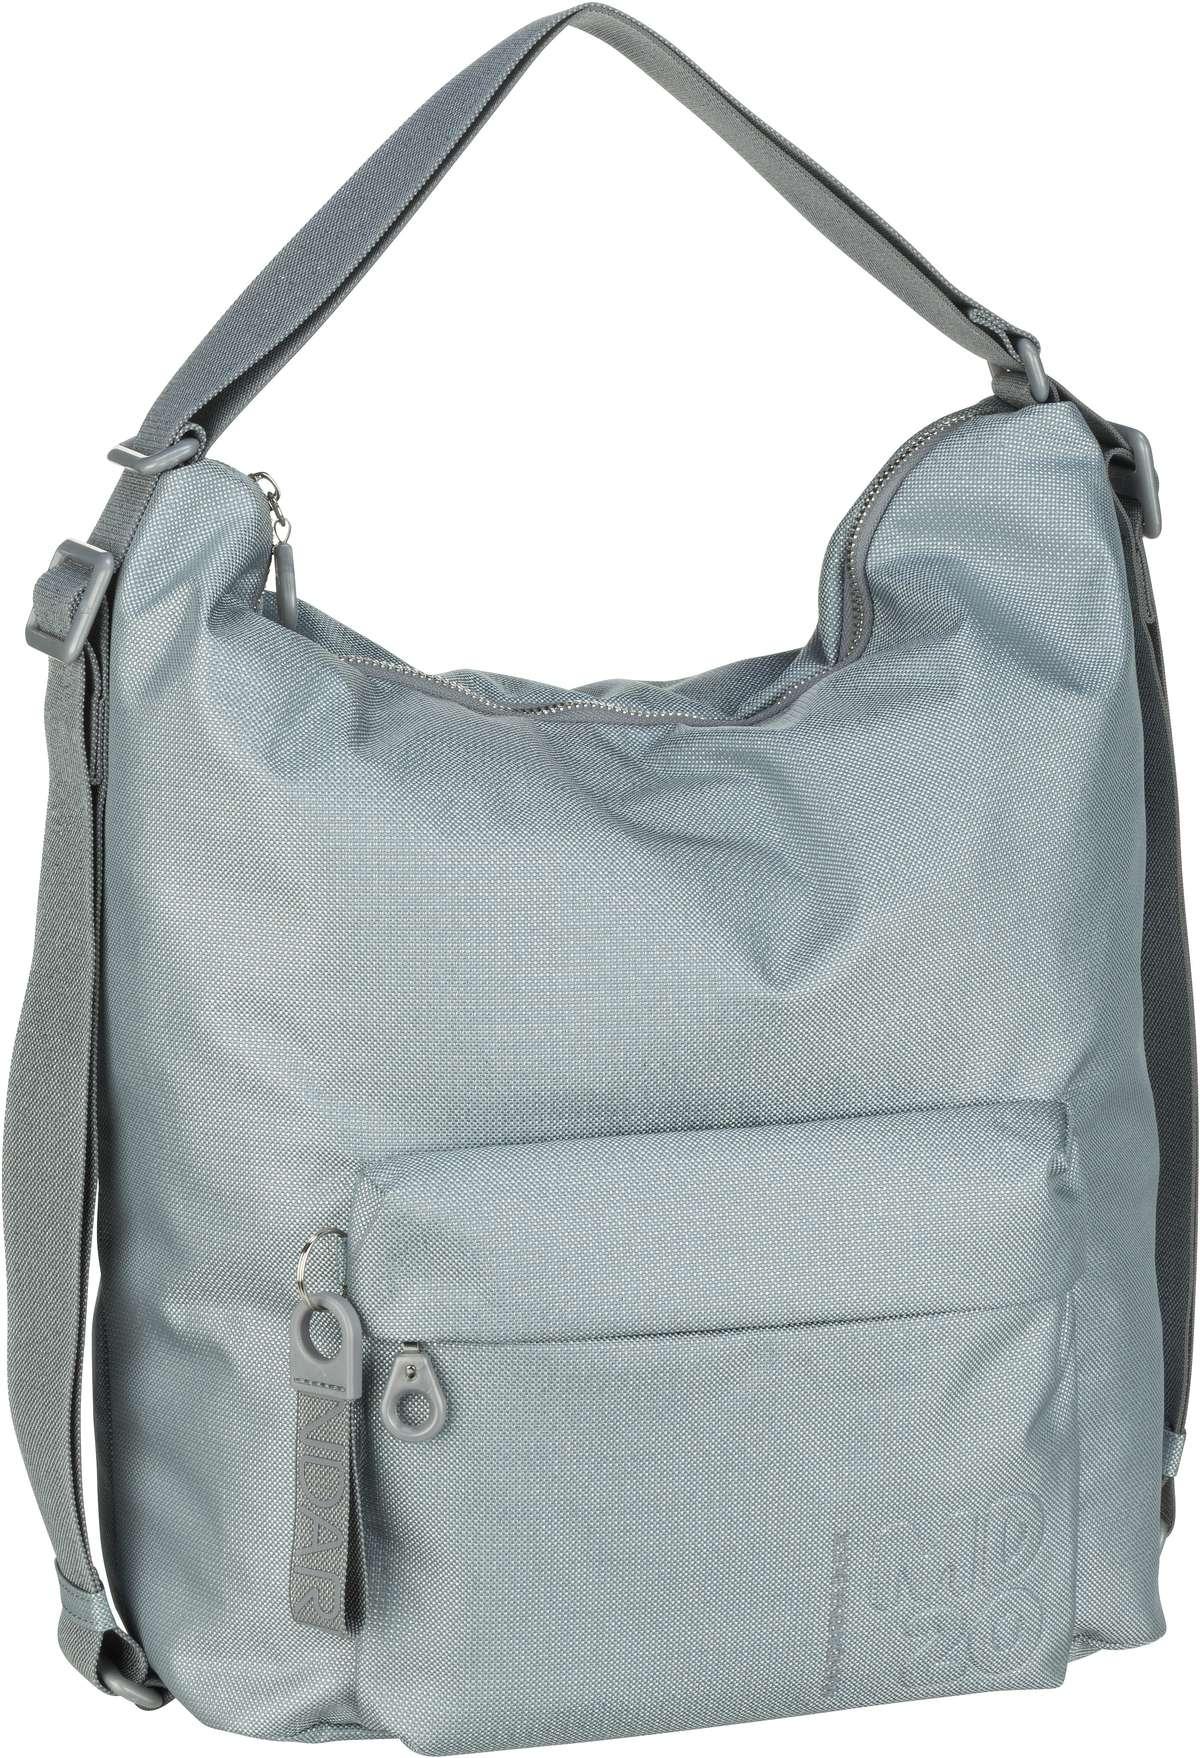 mandarina duck -  Beuteltasche MD20 Lux Hobo Backpack QNT09 Titanio